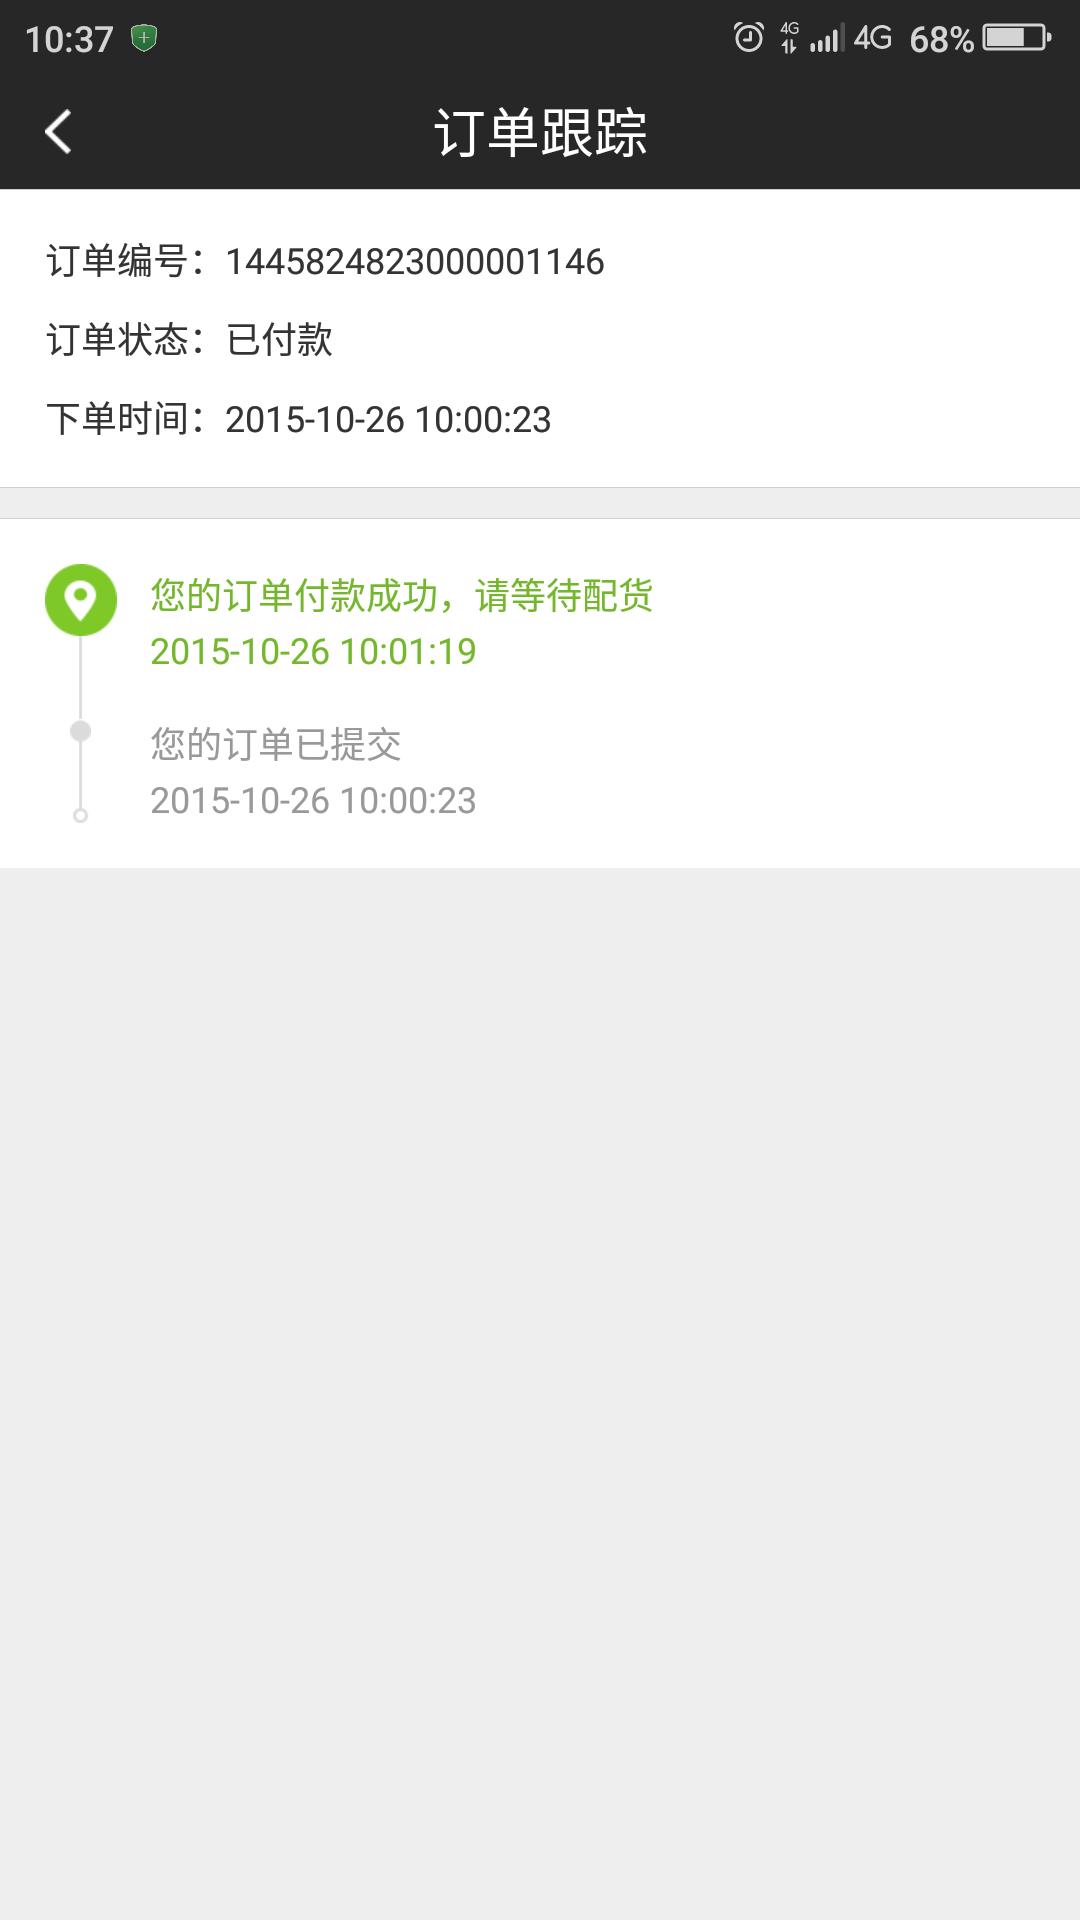 Screenshot_2015-10-26-10-37-15.png